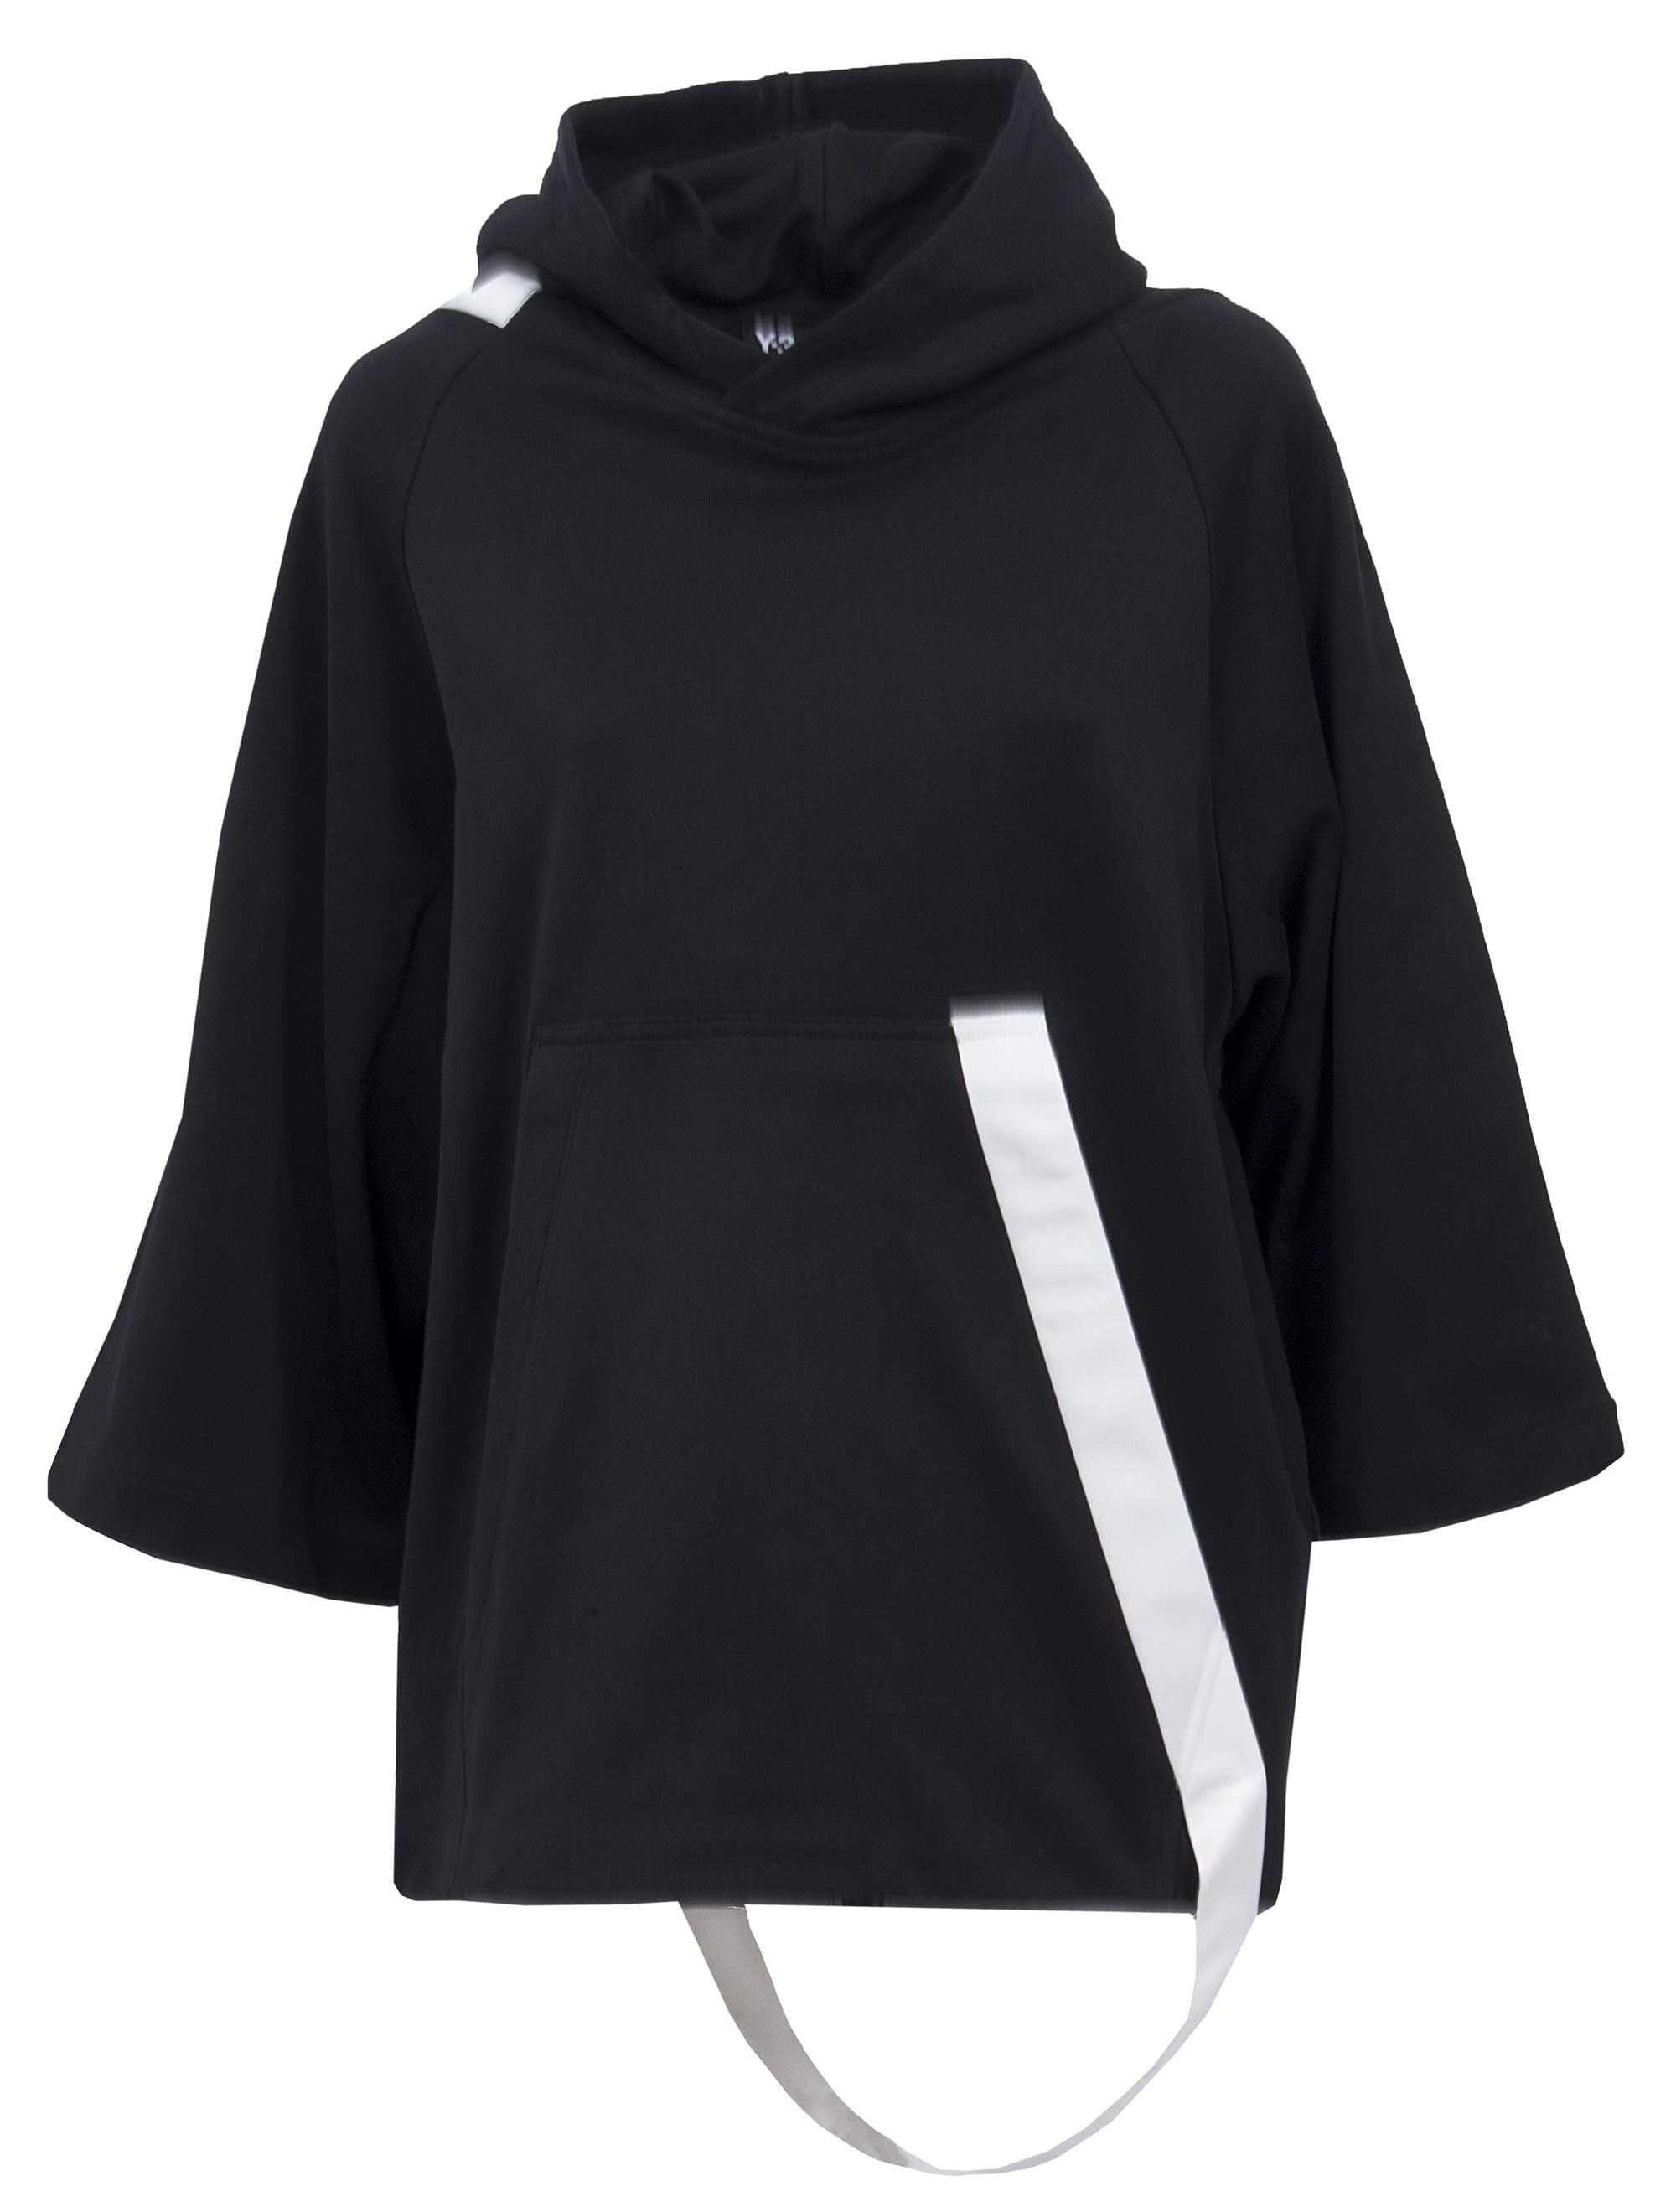 Y-3 Hoody Sweatshirt